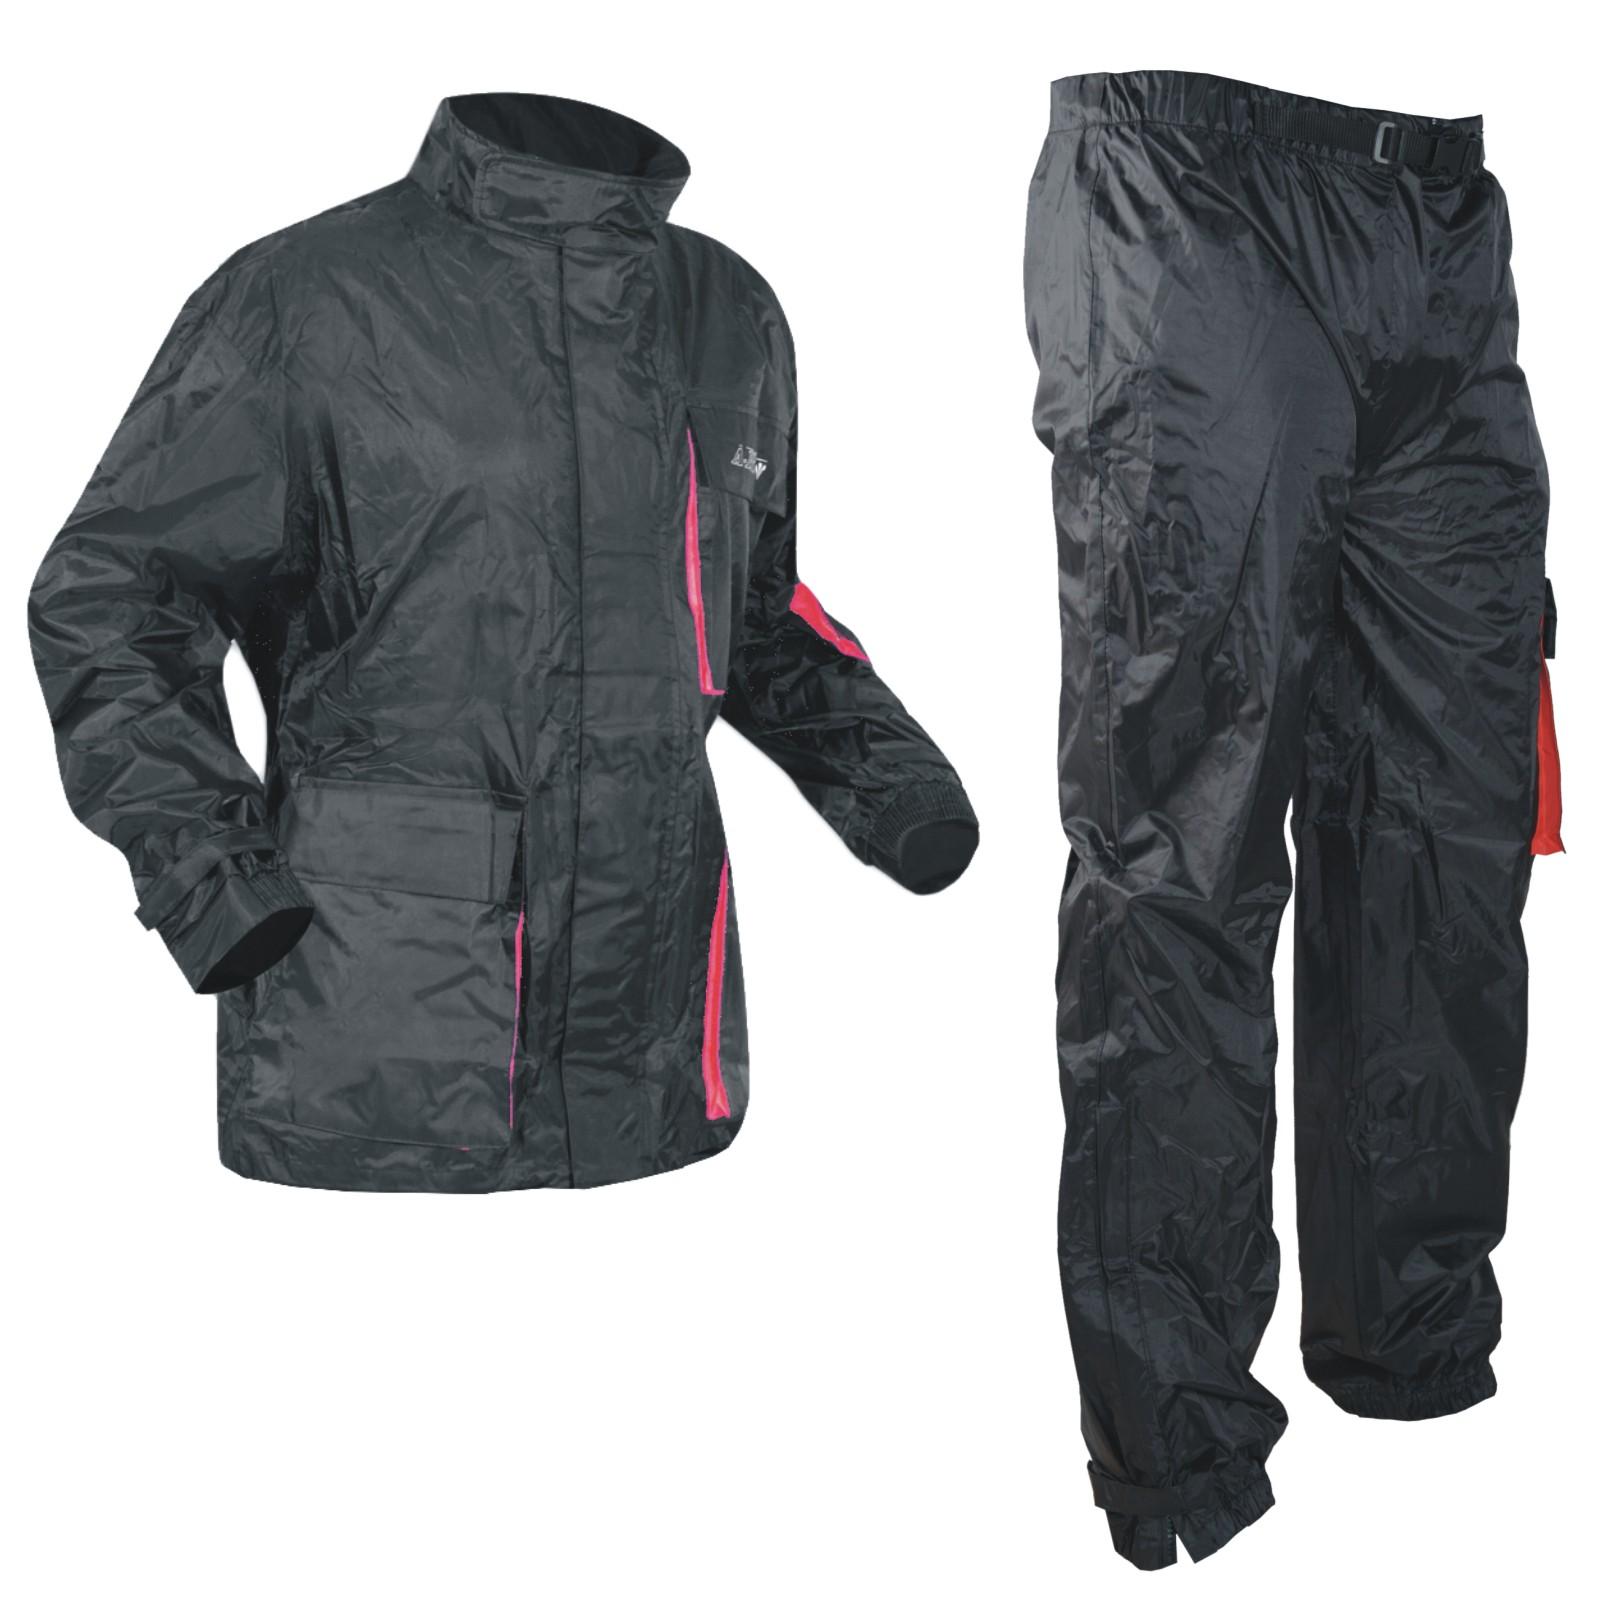 Impermeabile-2-Pezzi-Anti-Pioggia-Tuta-Pantaloni-Giacca-Pantoloni-Moto-Scooter